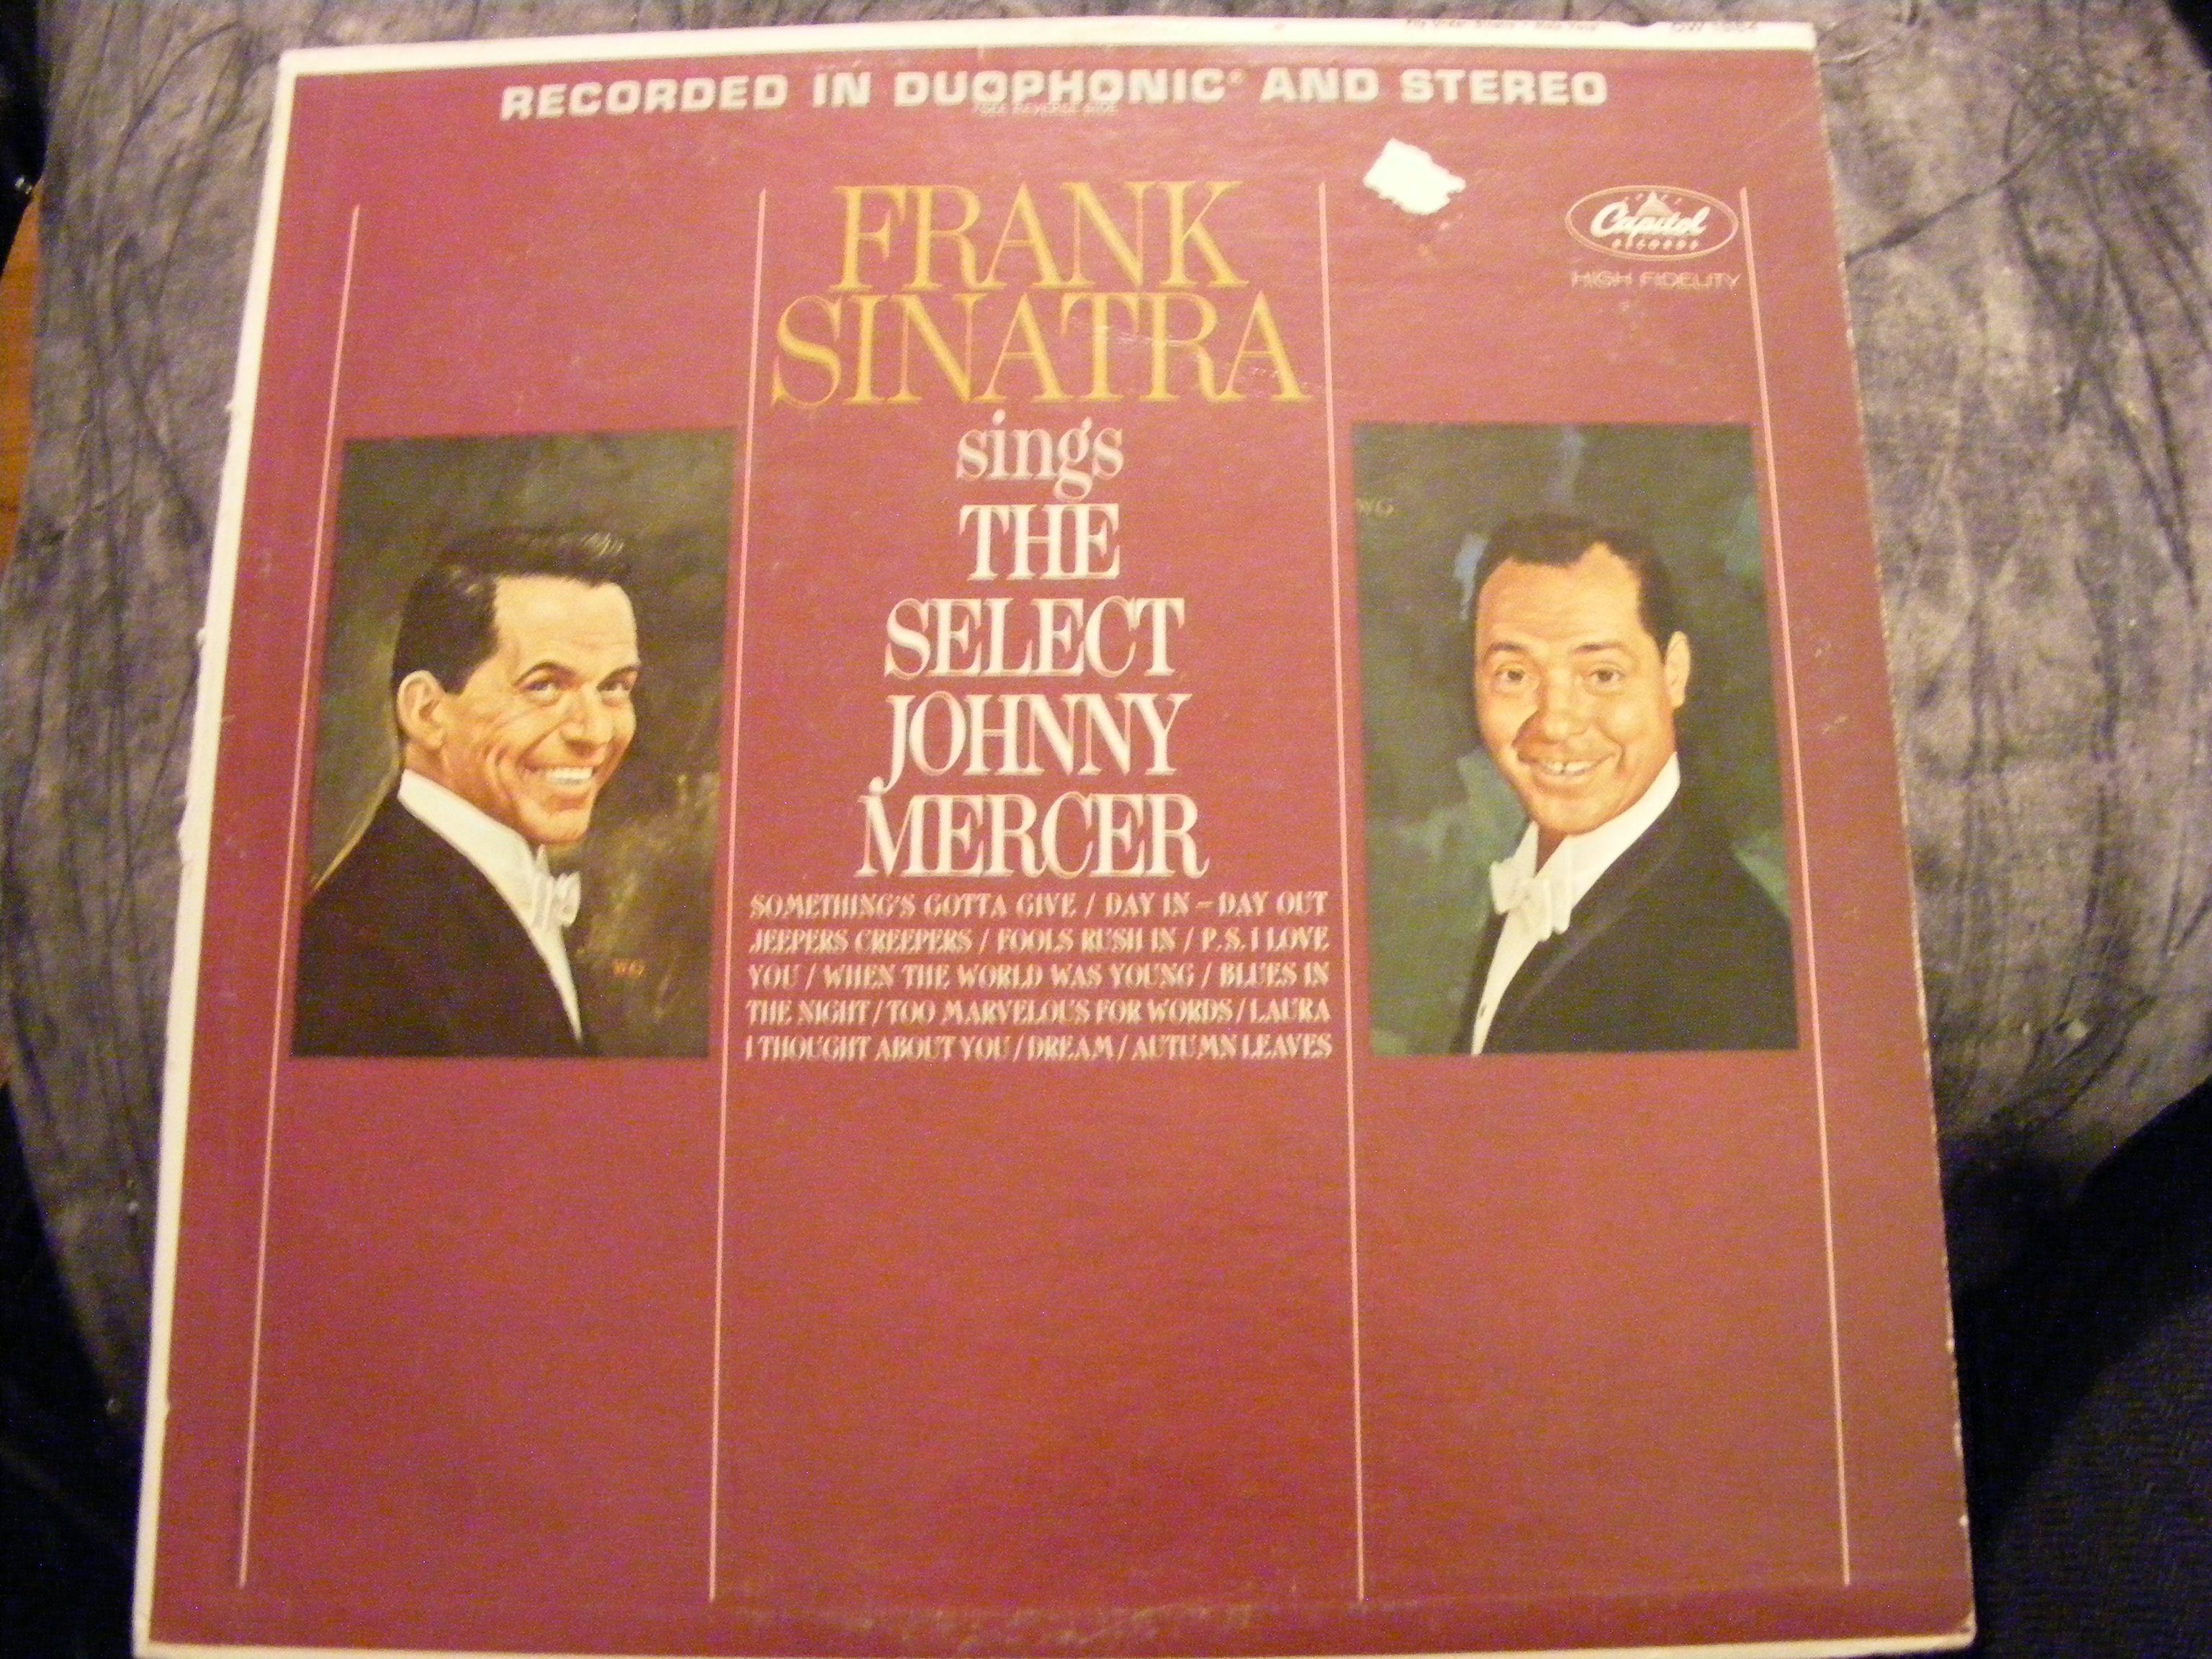 Frank Sinatra Sings The Select Johnny Mercer Album Cover 1984